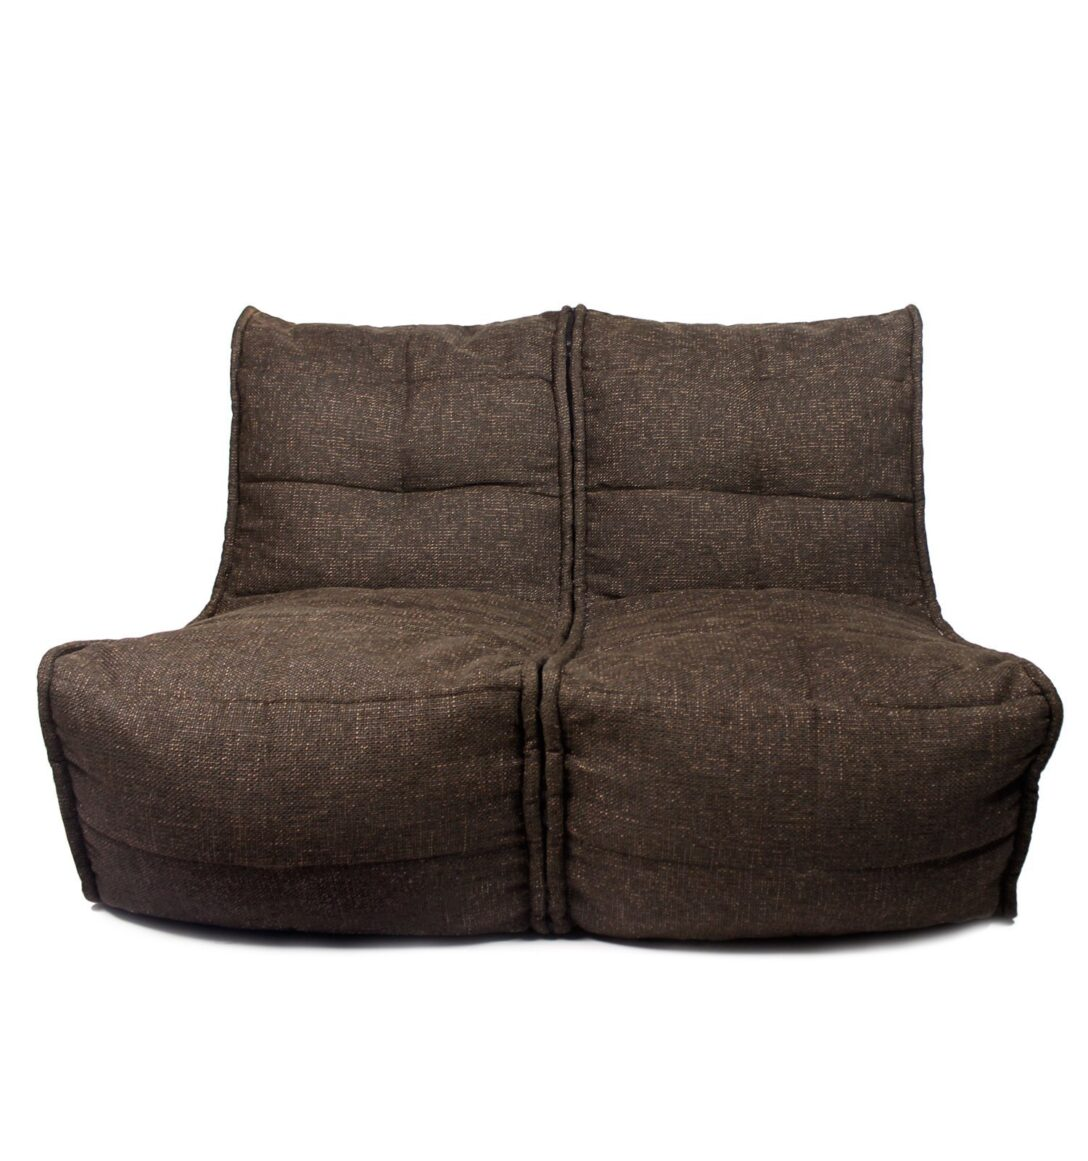 Large Size of Sitzsack Sofa Twin Hot Chocolate Ambientyou Mit Abnehmbaren Bezug 2 Sitzer Neu Beziehen Lassen Stoff Grau Polsterreiniger Langes Petrol Lagerverkauf Xxxl Sofa Sitzsack Sofa